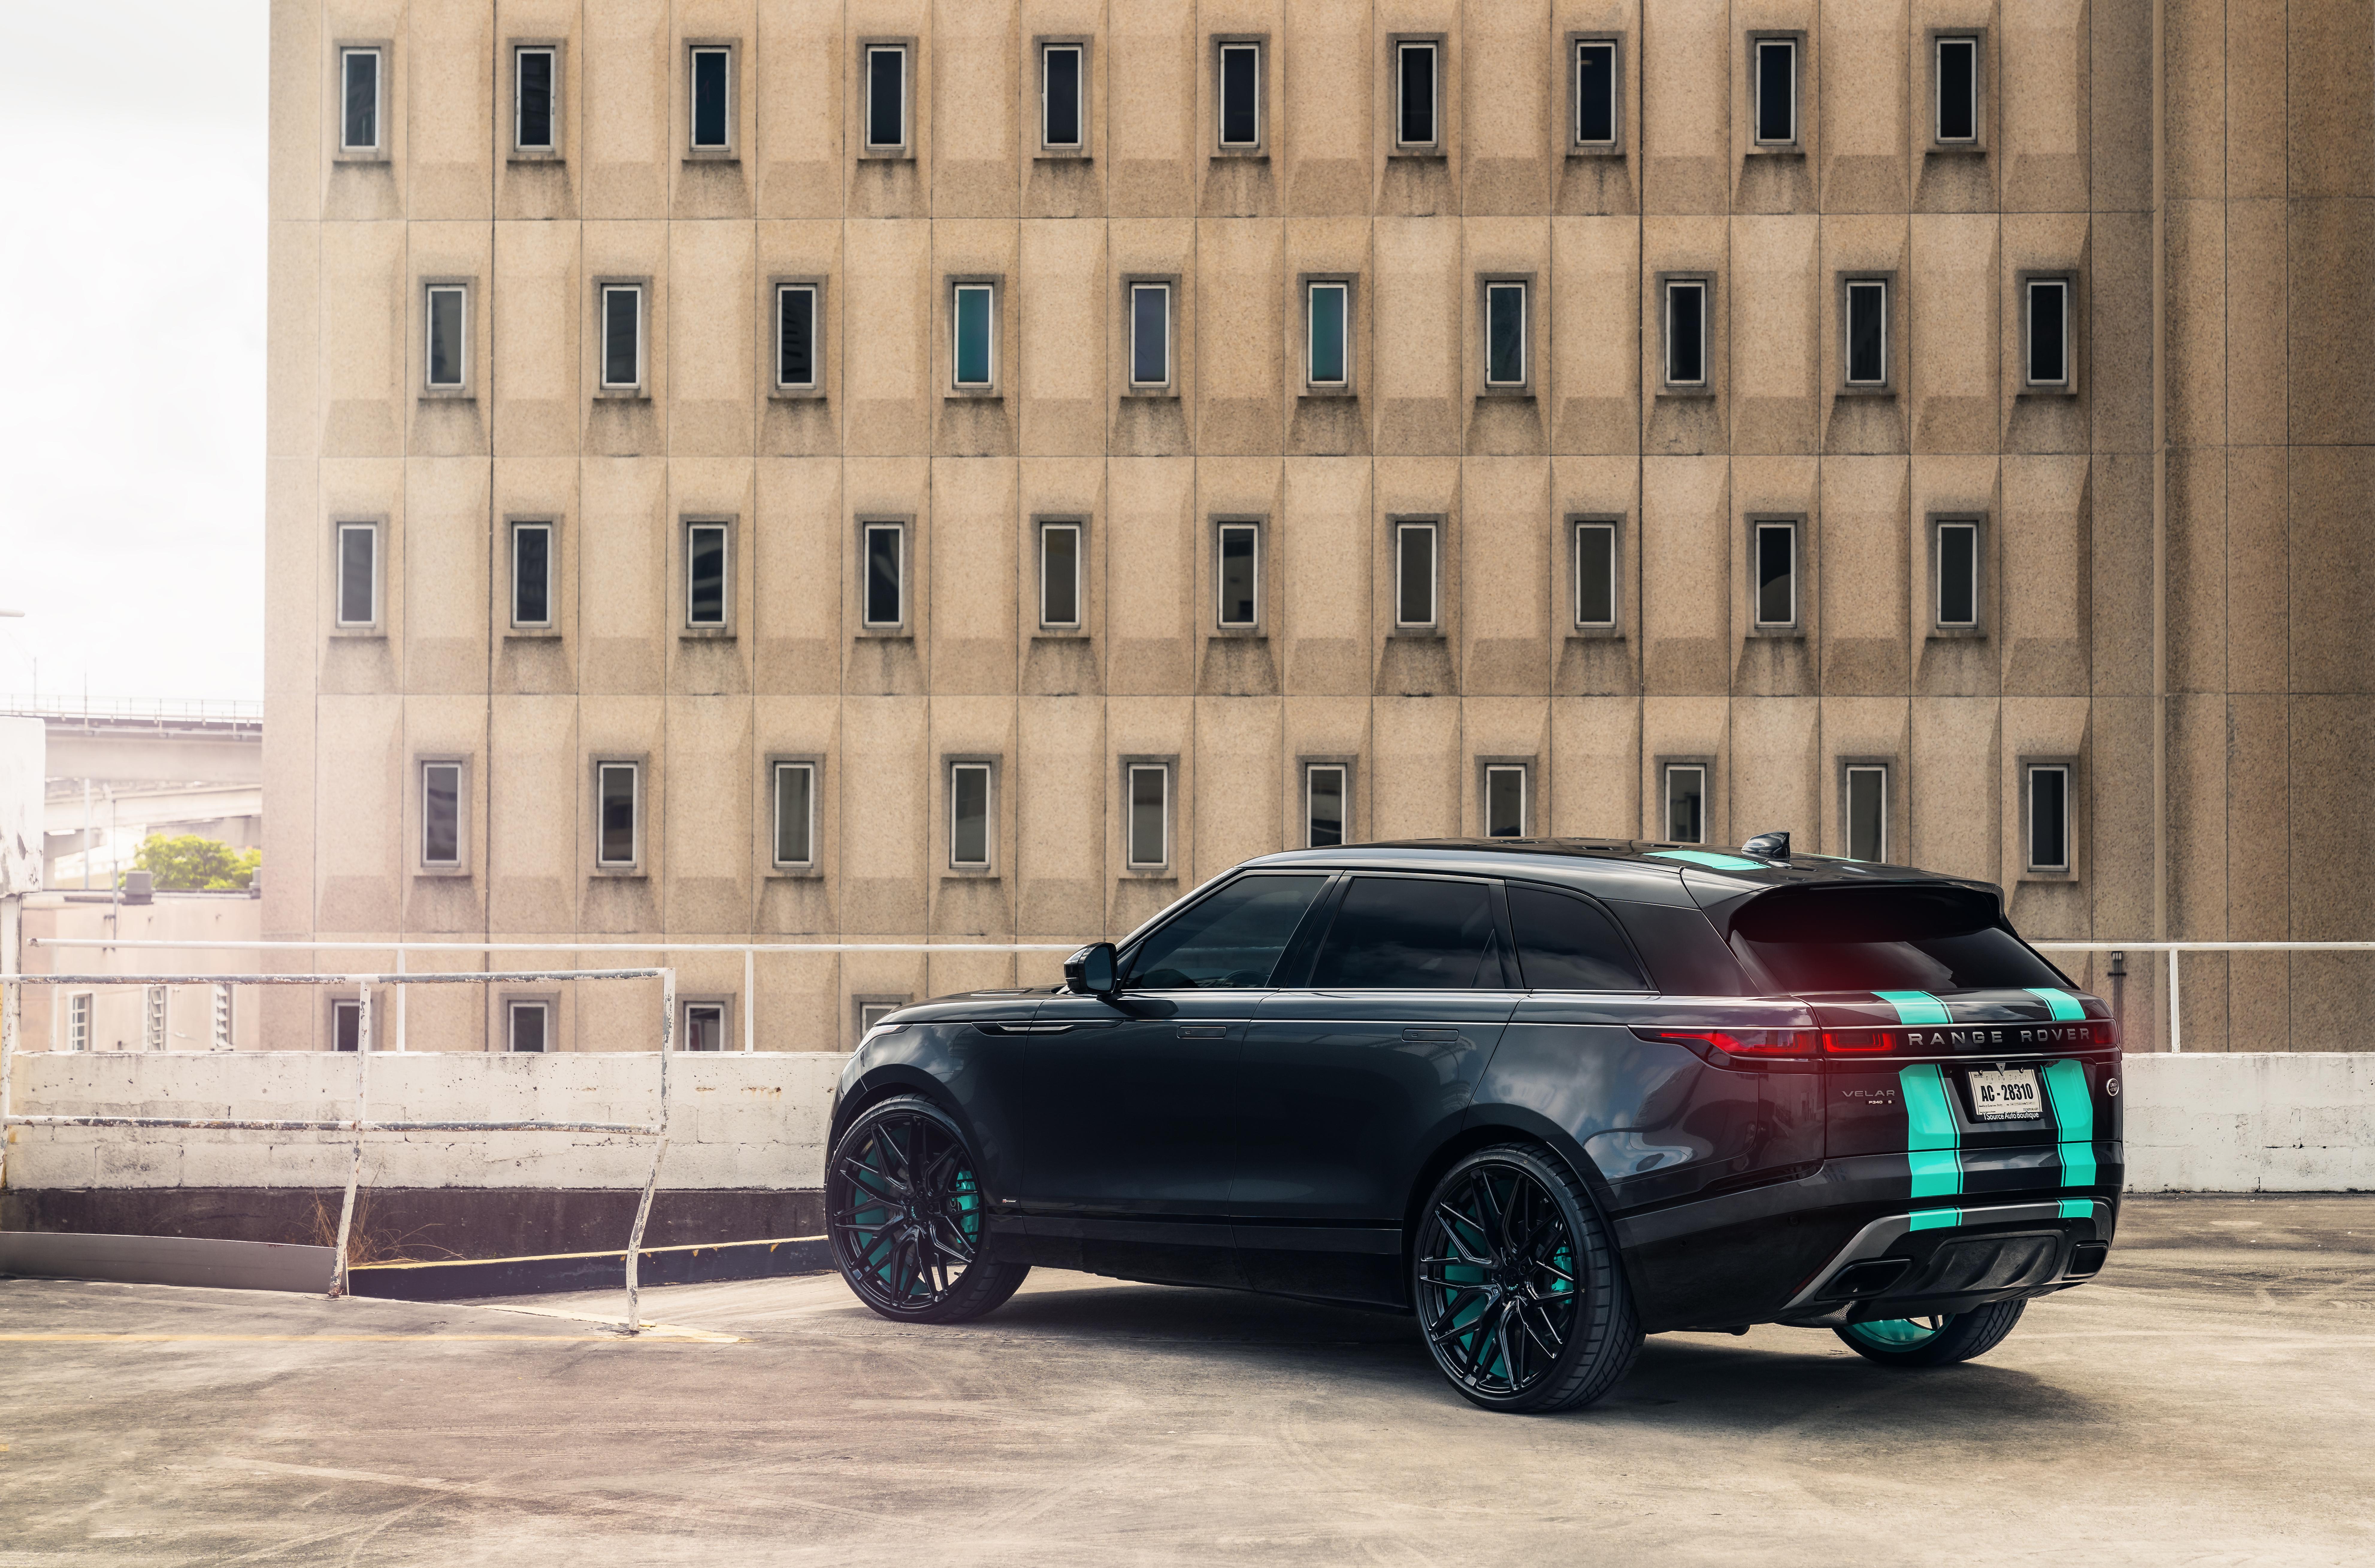 lianko velos range rover velar 4k 1626180010 - Lianko Velos Range Rover Velar 4k - Lianko Velos Range Rover Velar 4k wallpapers